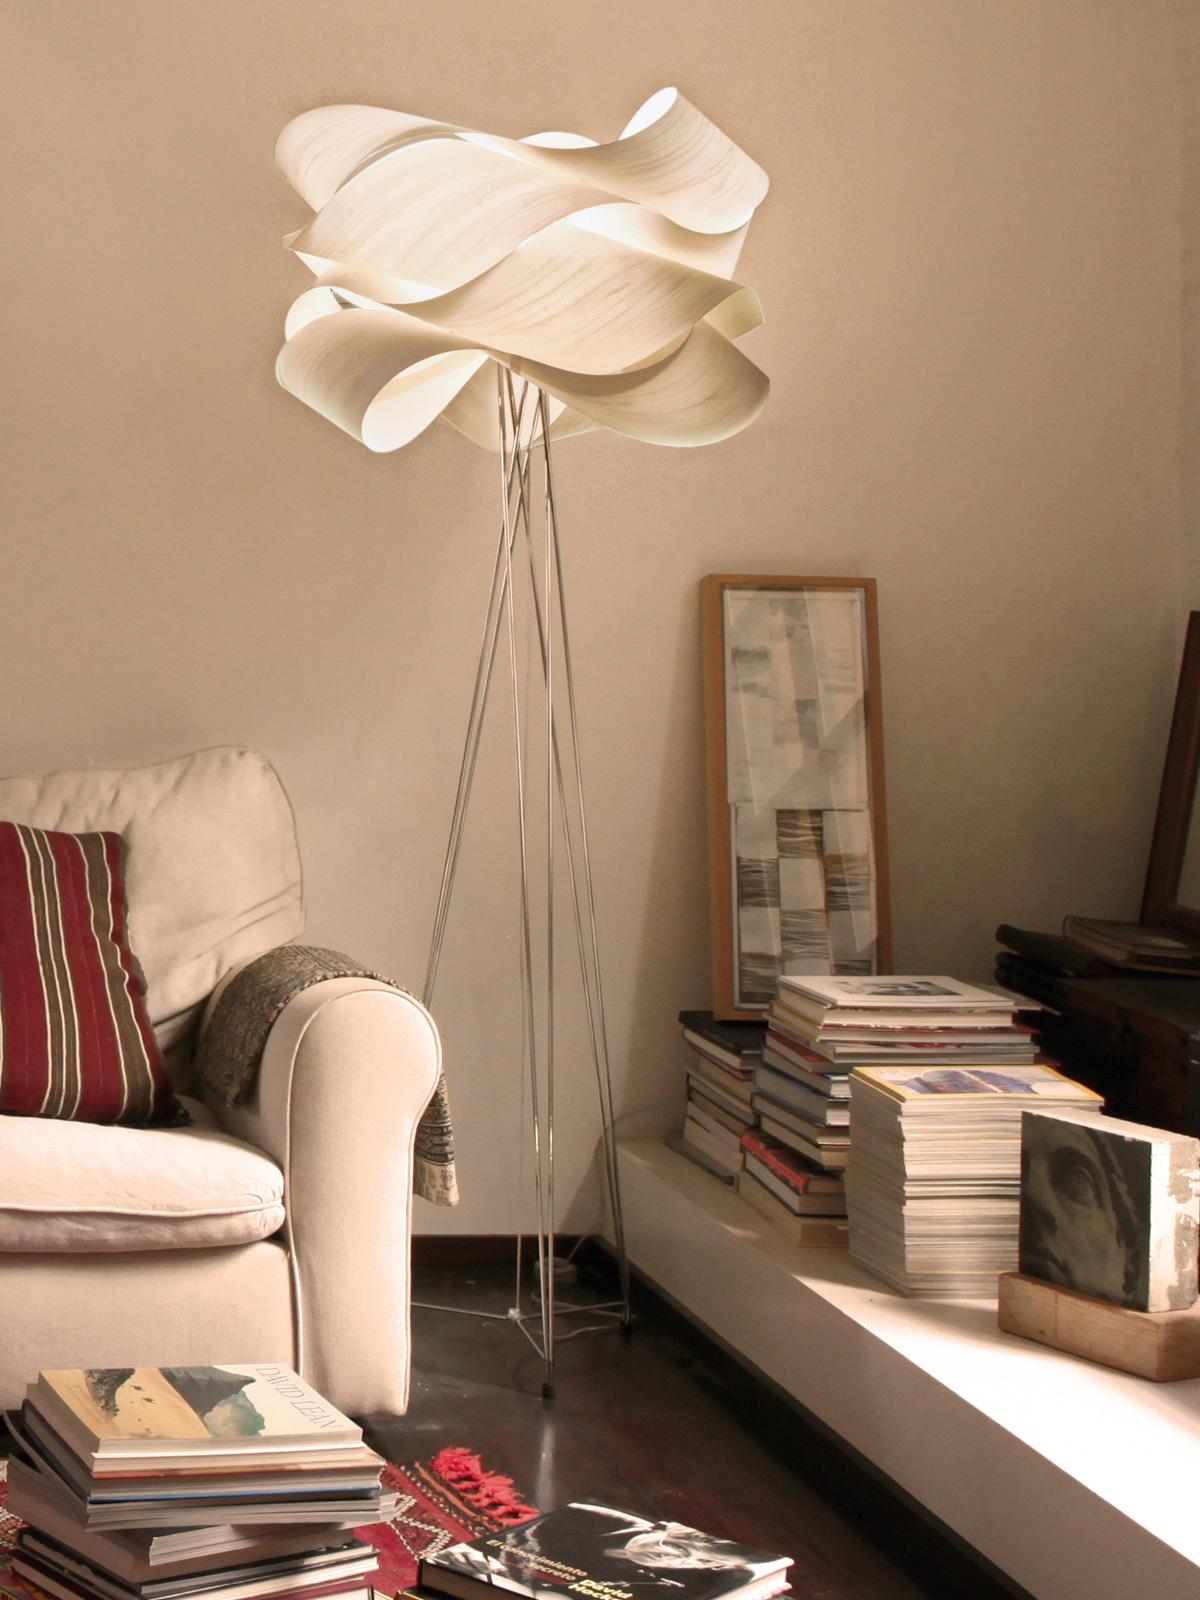 Link P Stehleuchte LZF Lamps DesignOrt Onlineshop Lampen Berlin